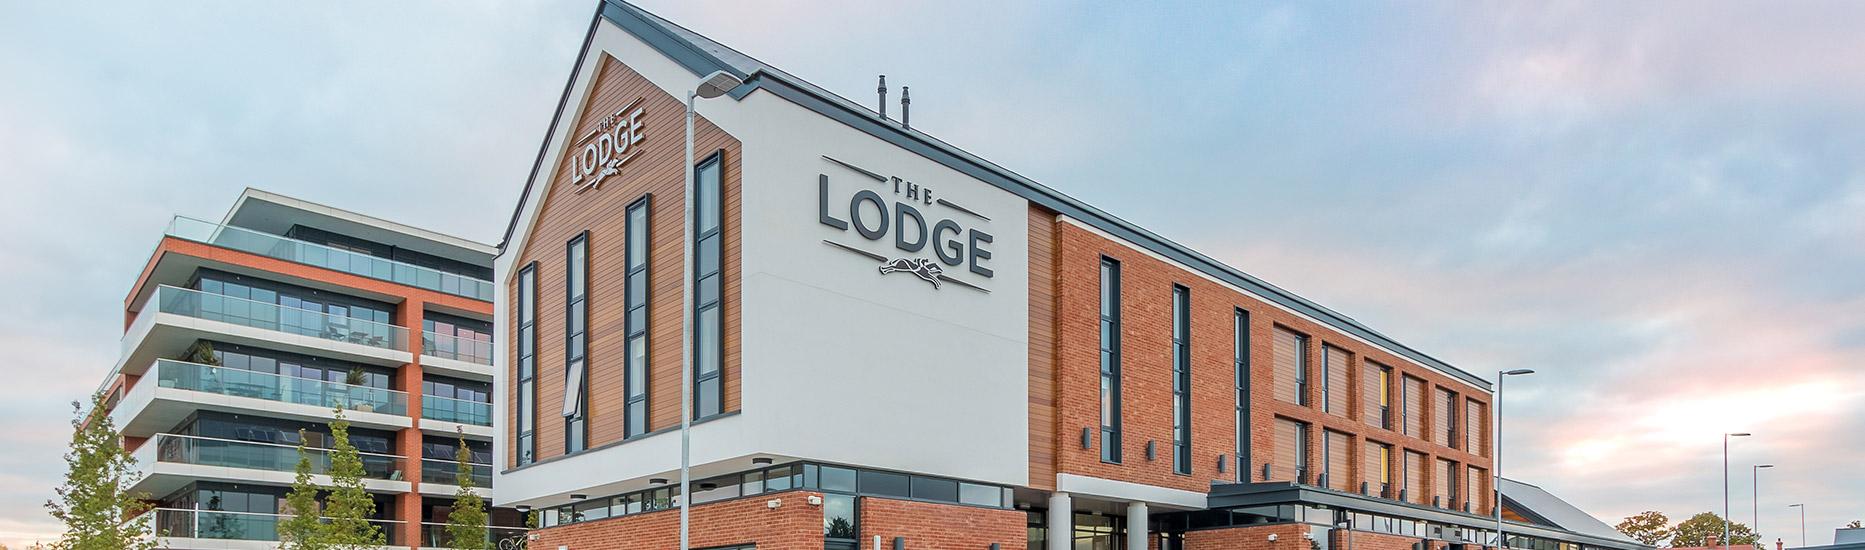 The-Lodge-Hotel